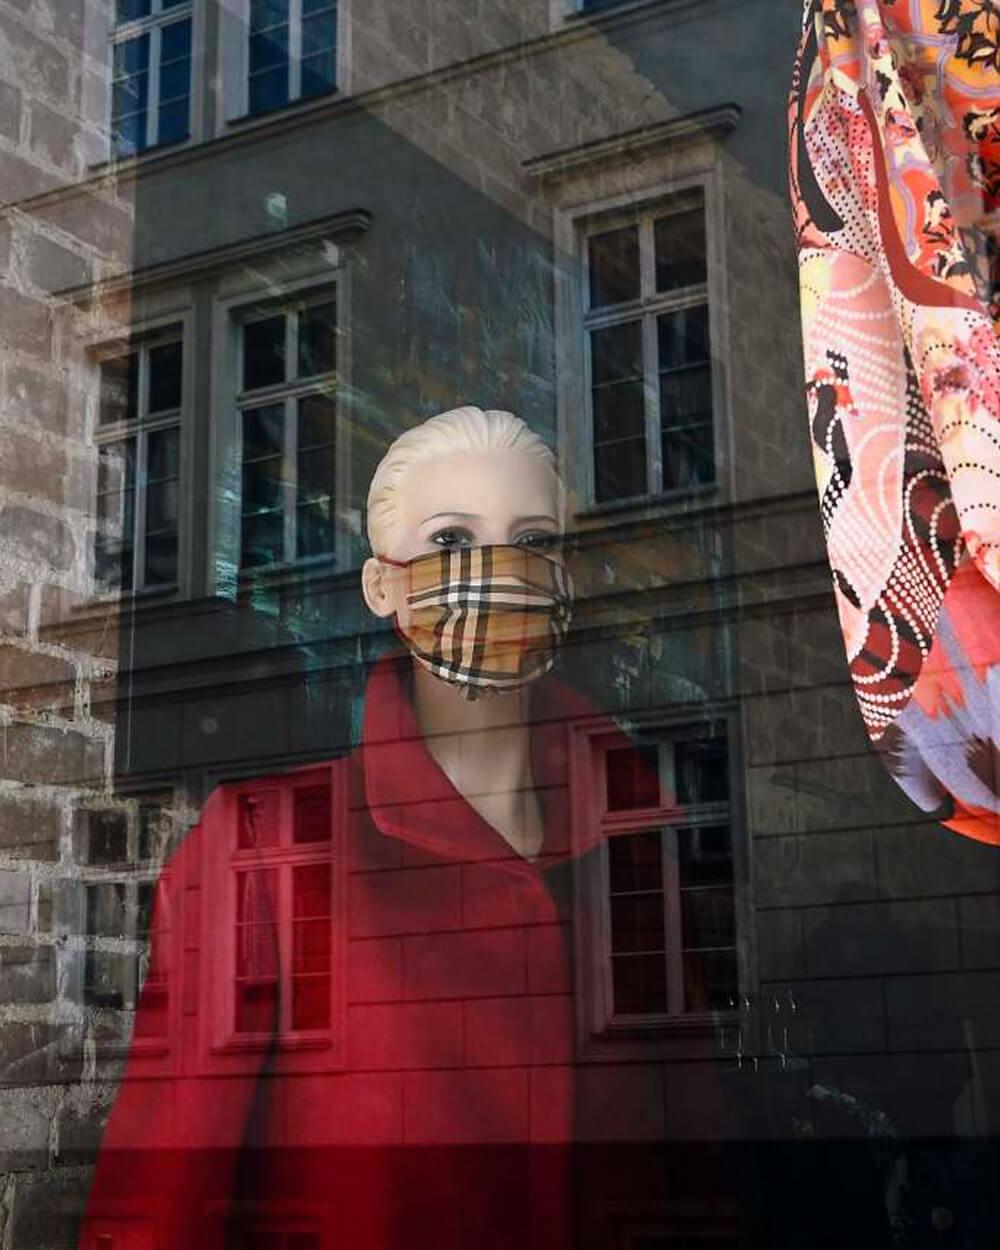 Covid 19 uk fashion impact - Burberry mask